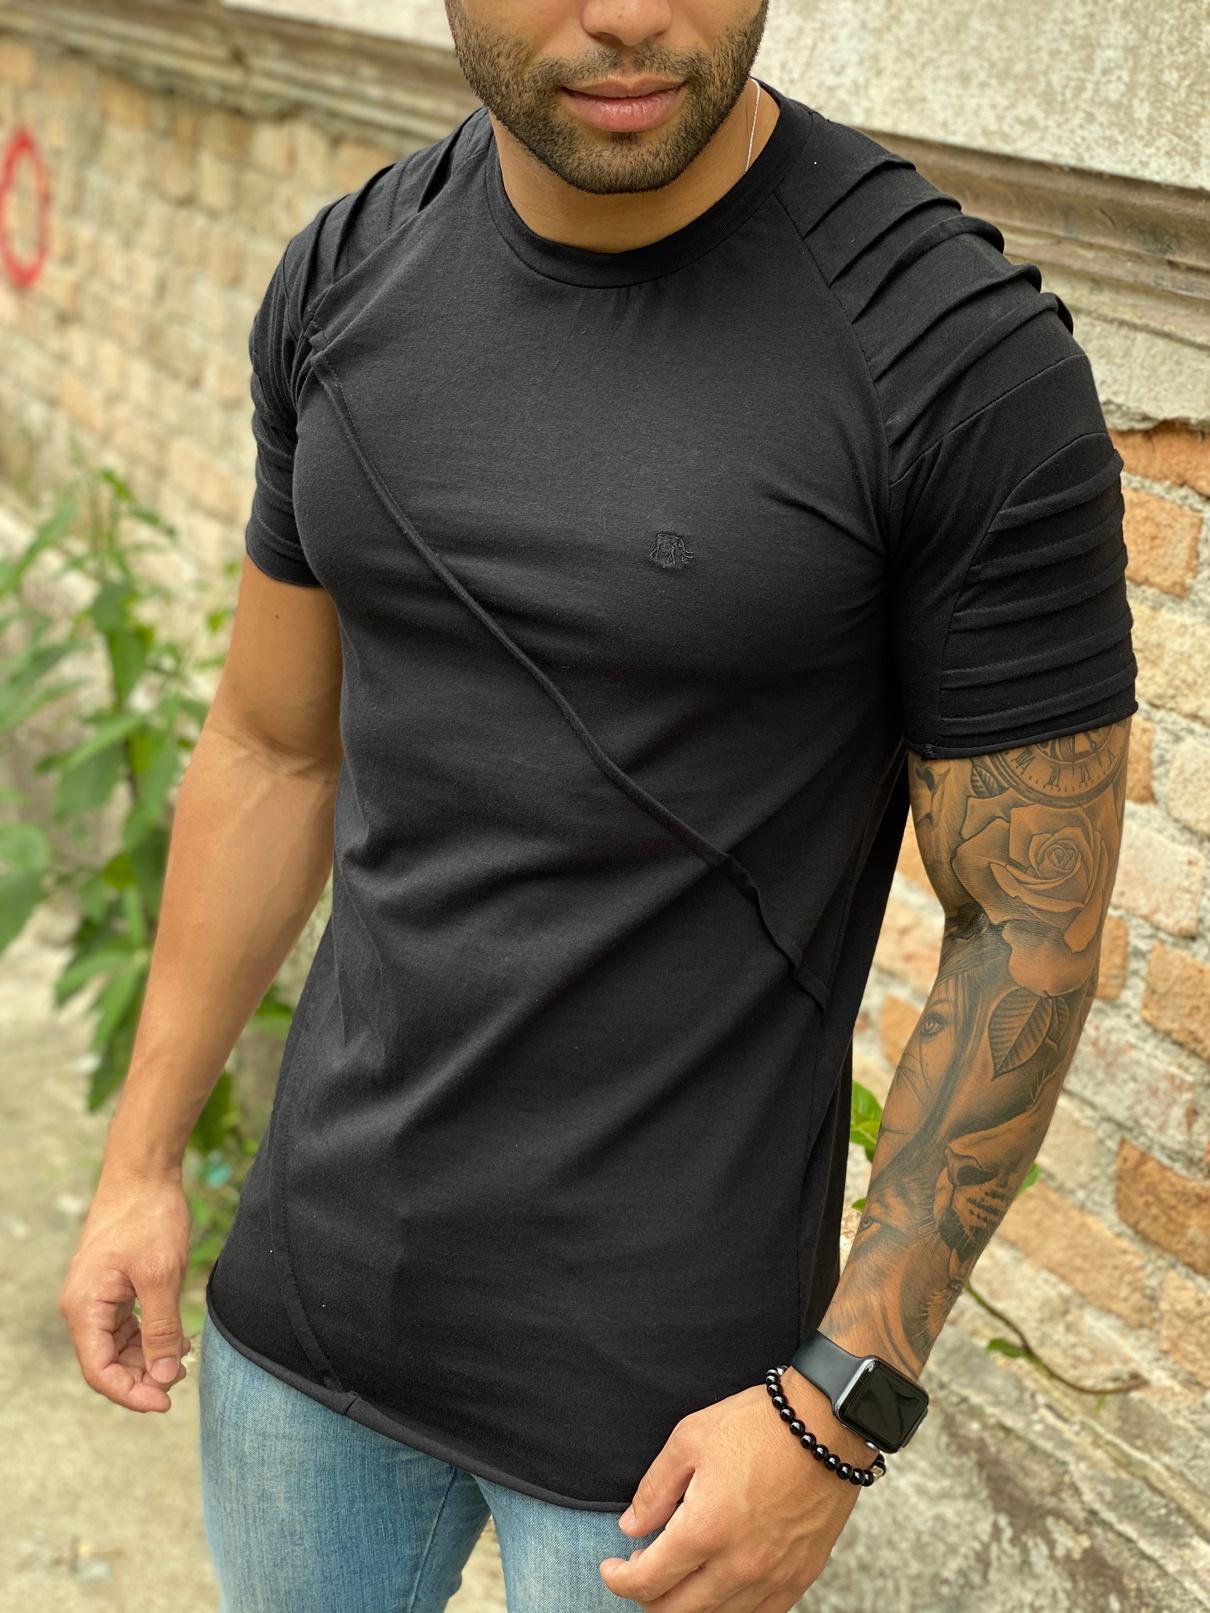 Camisa Manga Longa M Artt Cinza Detalhe Frente  - Harpia Moda - Moda Masculina & Acessórios